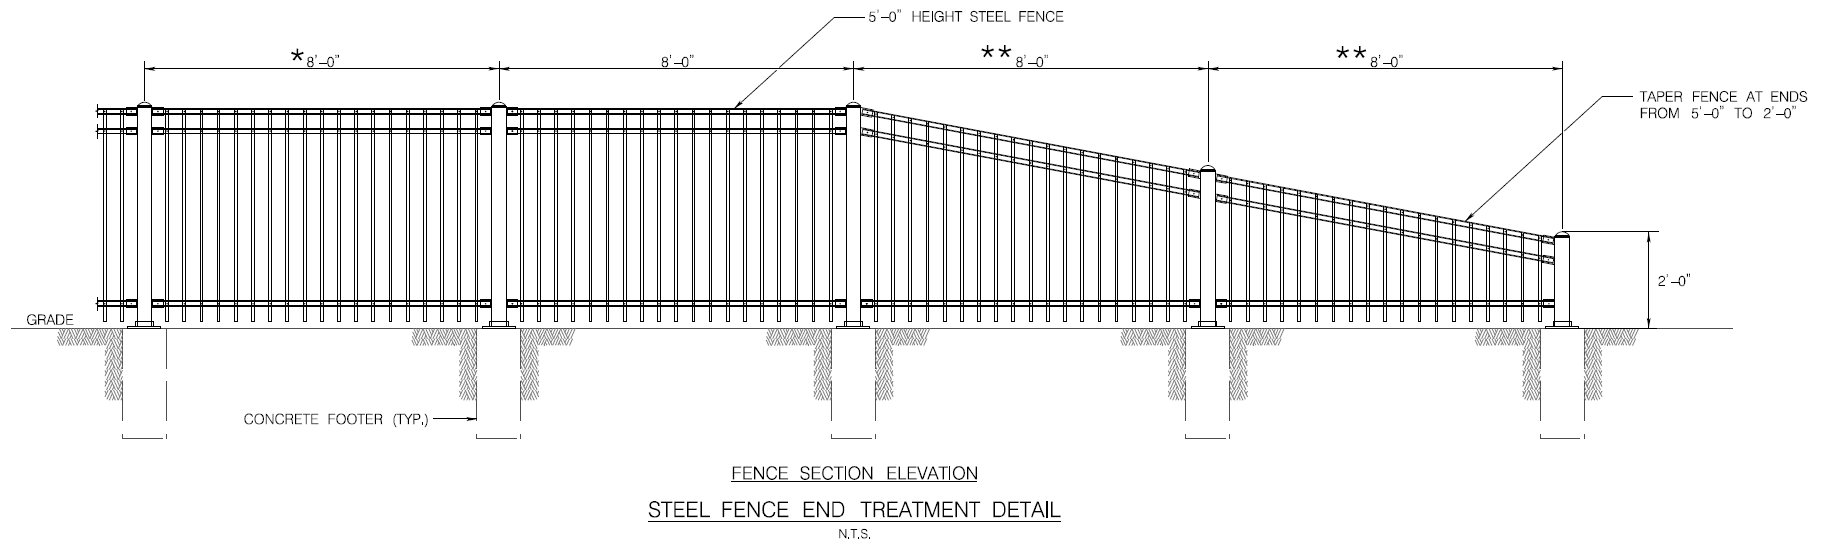 Rt1 Fence